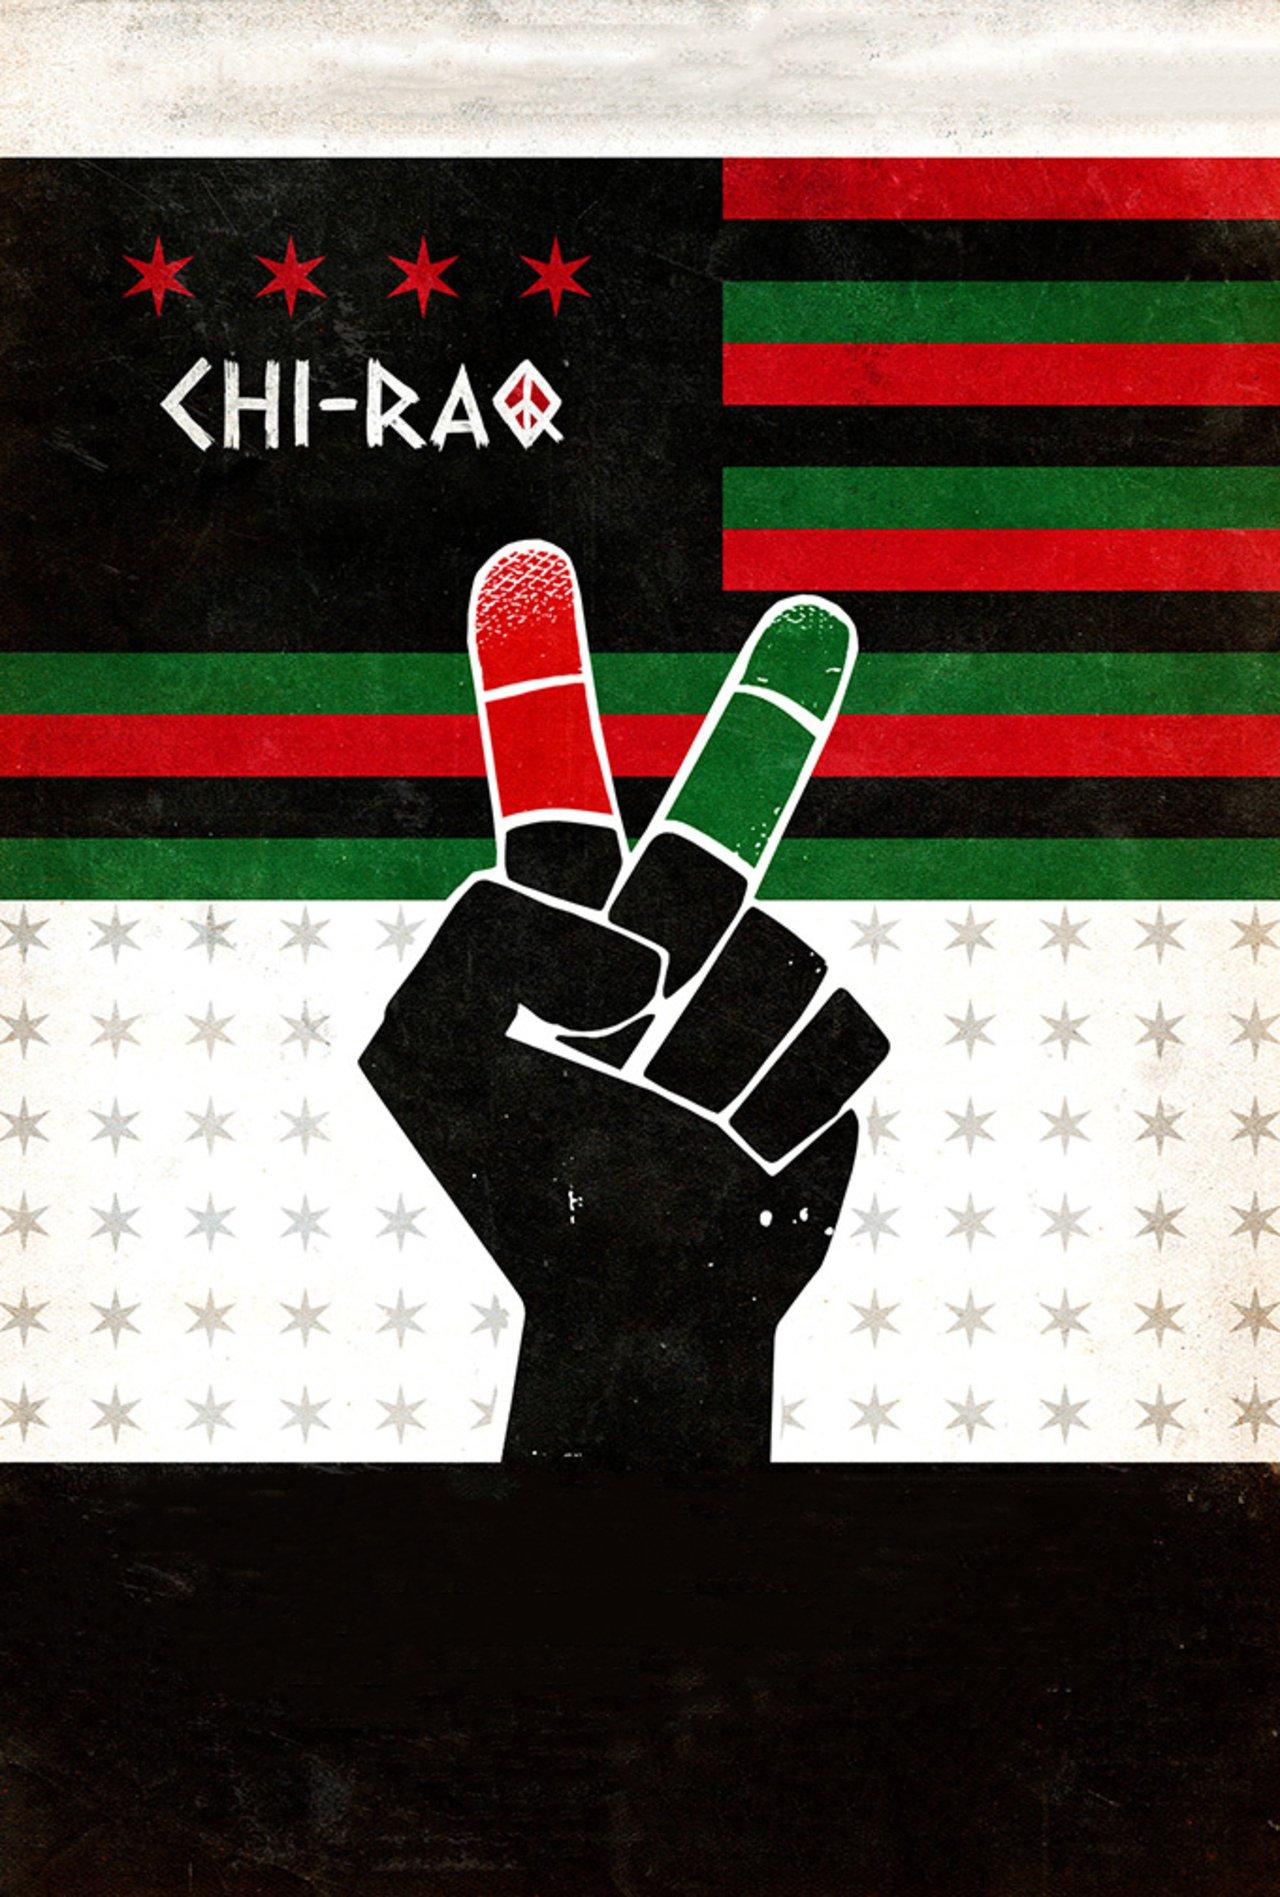 Poster for Chi-Raq